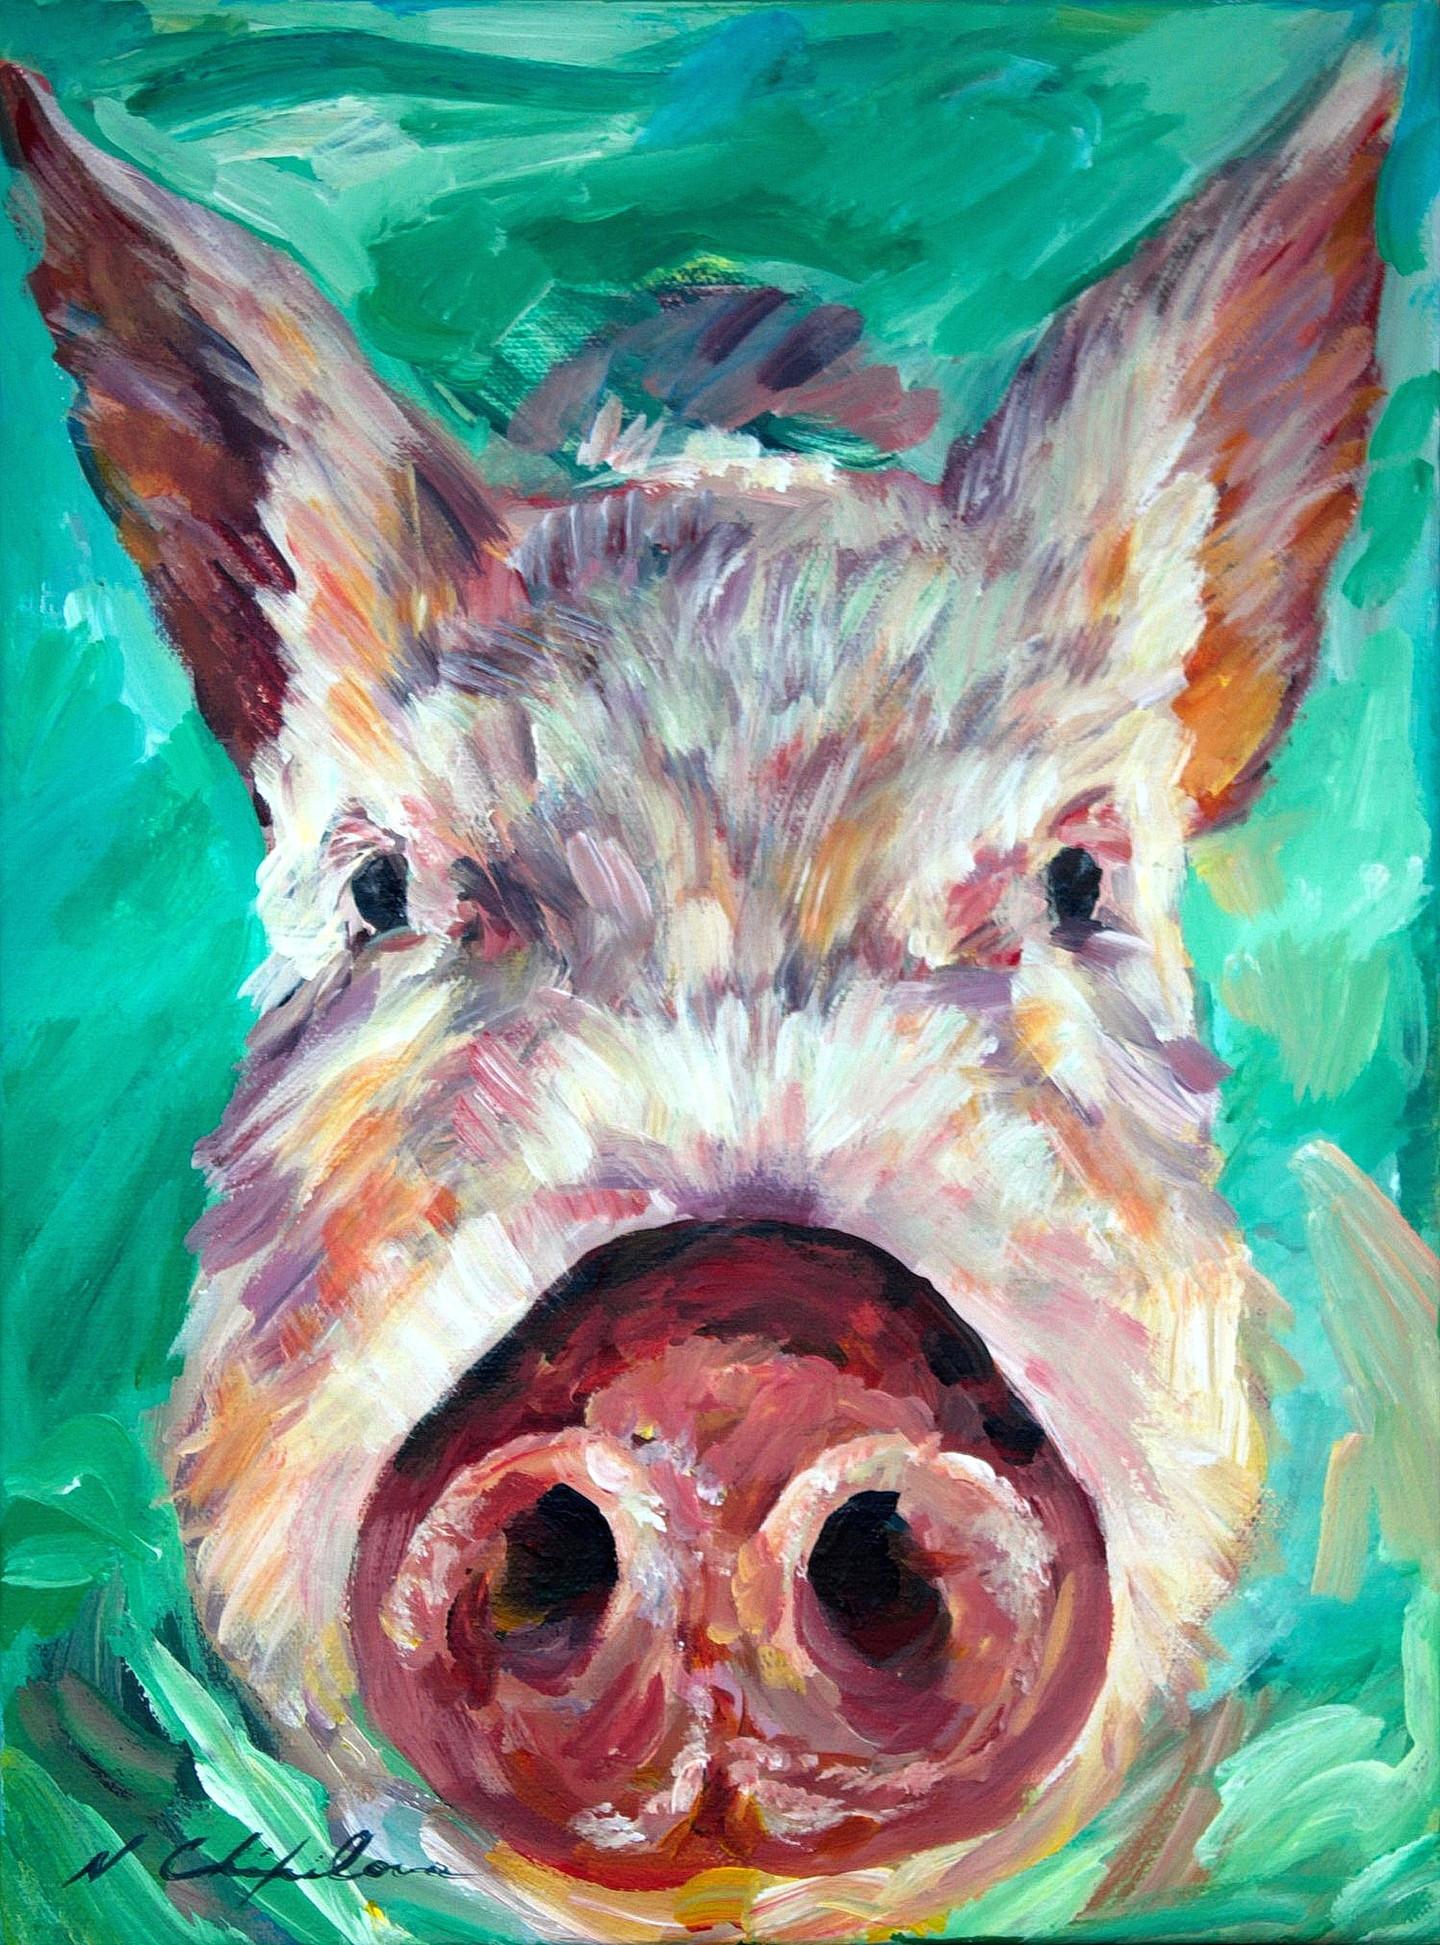 Nath Chipilova (Atelier NN art store) - Bahamas Pig